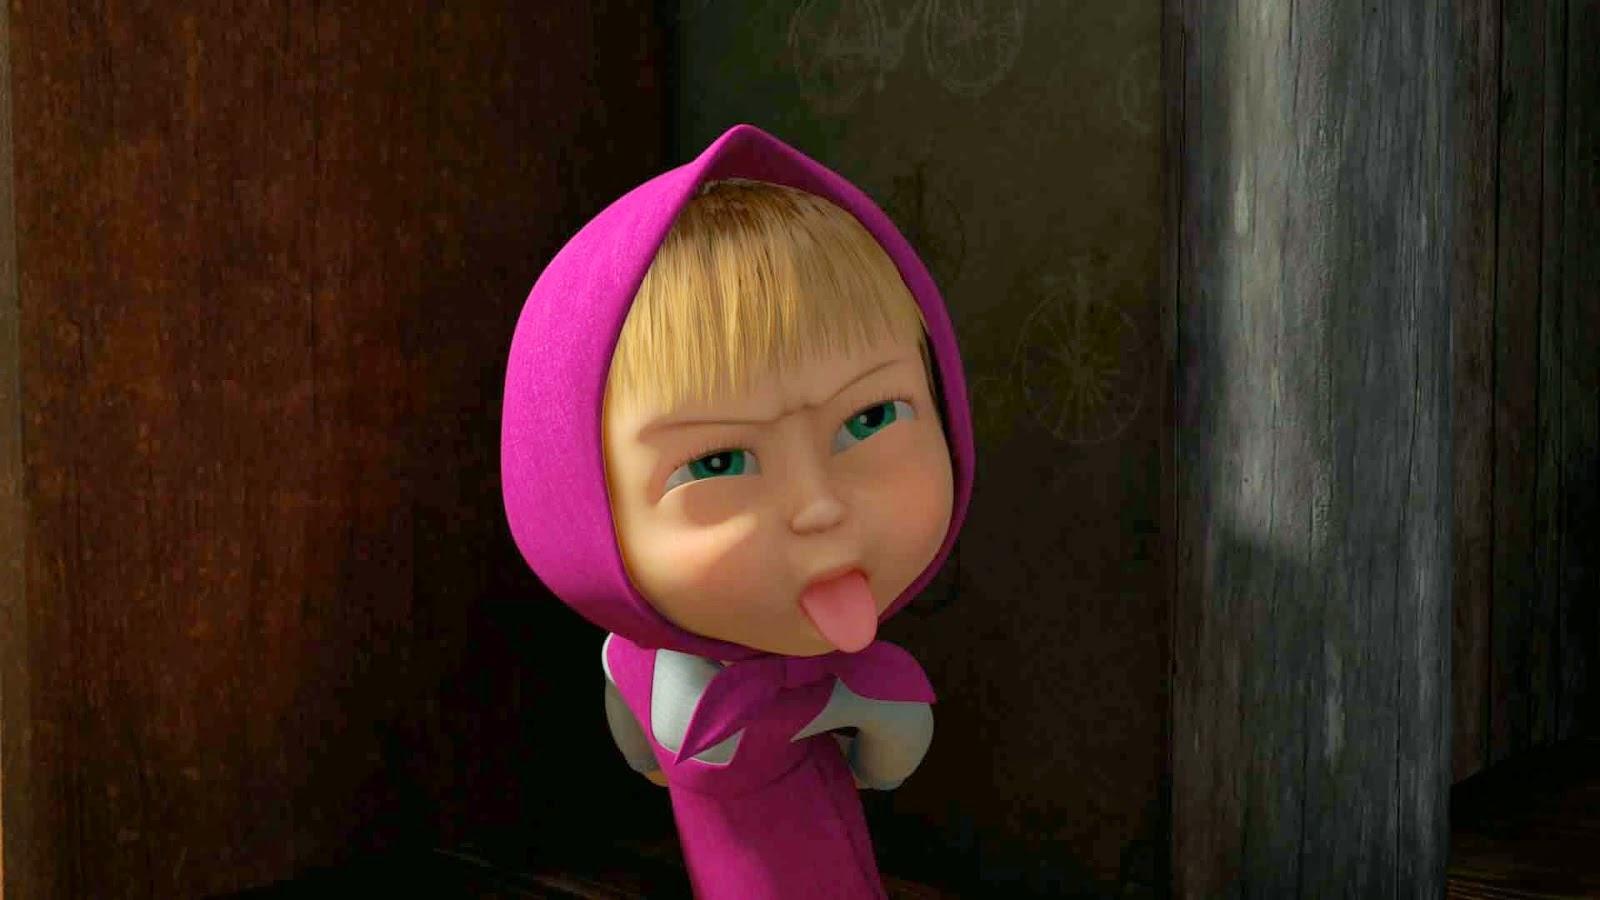 Animasi Bbm Stock Images Drama Blog